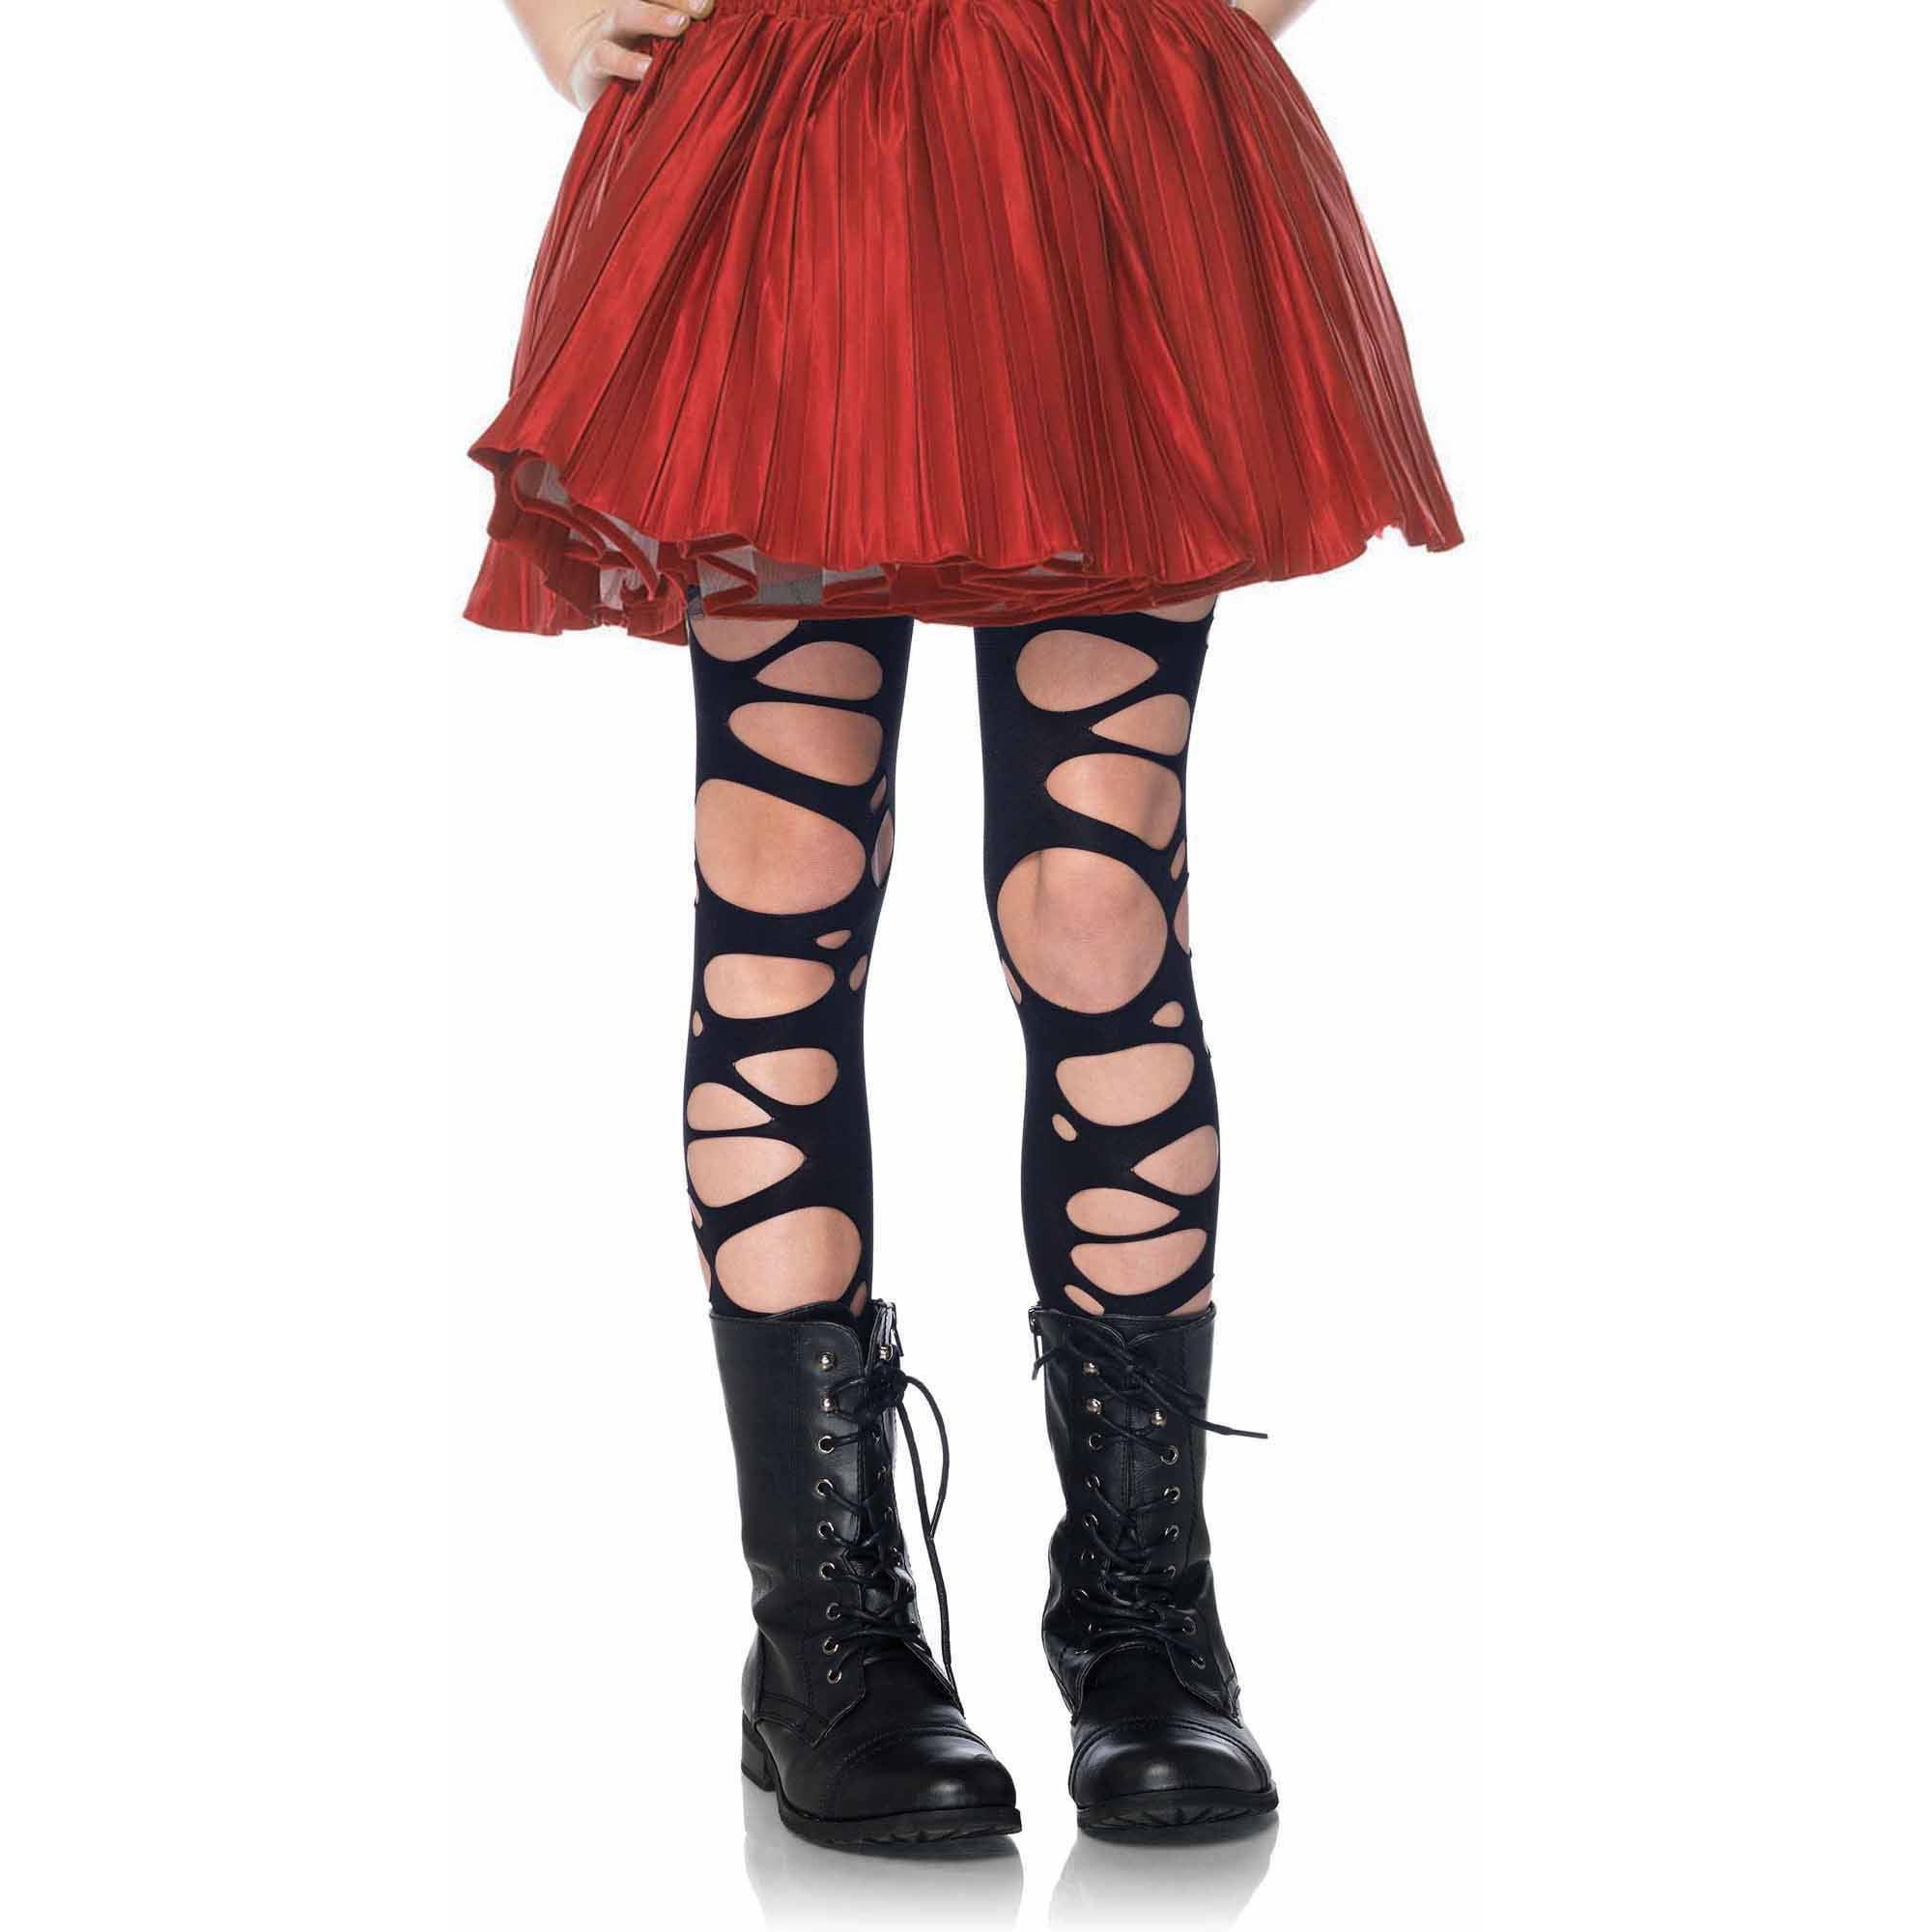 Leg Avenue Tattered Tights Adult Halloween Accessory